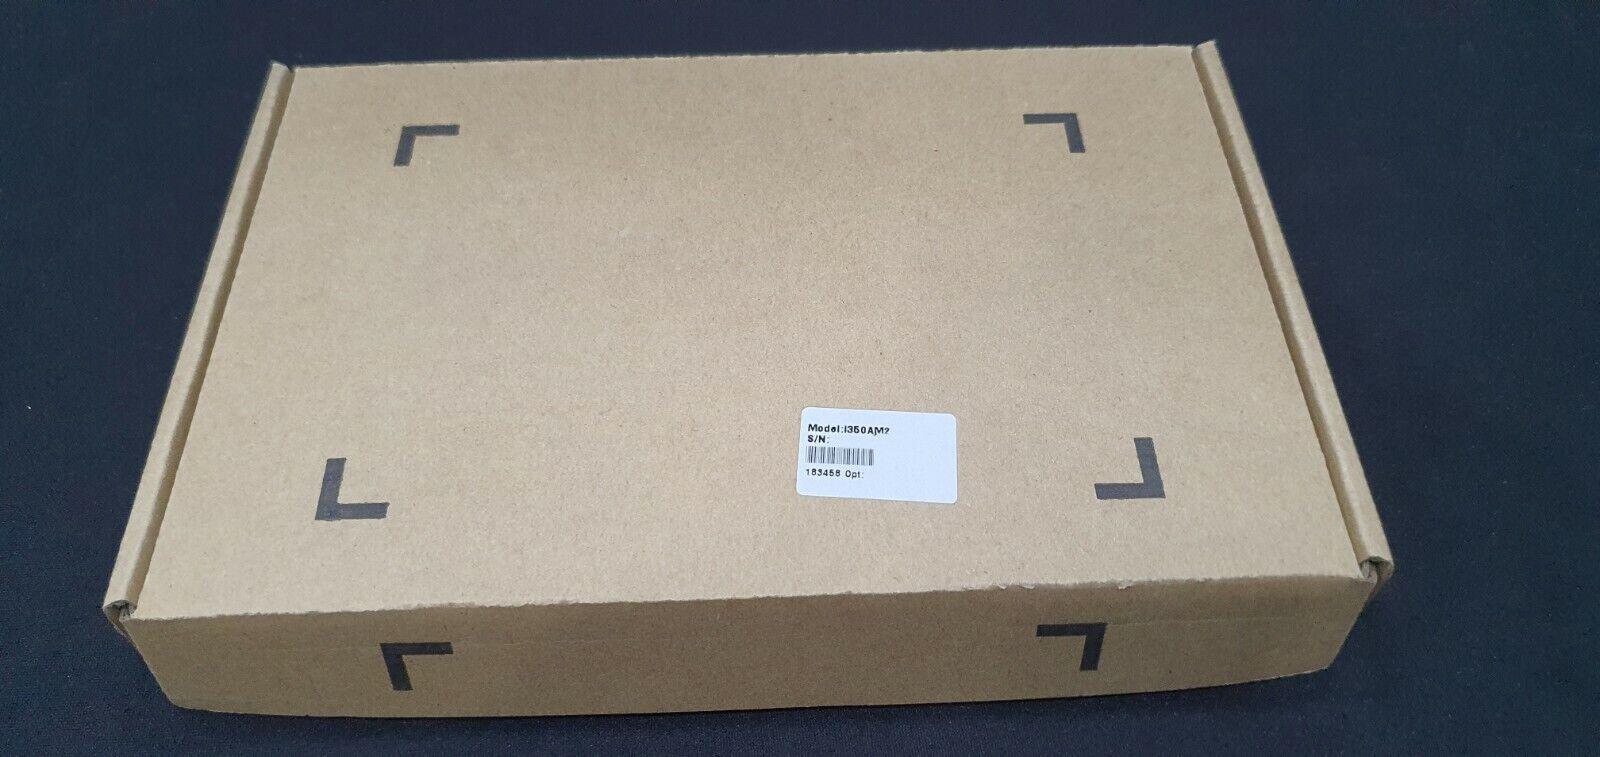 [NEW] INTEL i350AM2 : Dual RJ-45 Ethernet Network Card Adapter